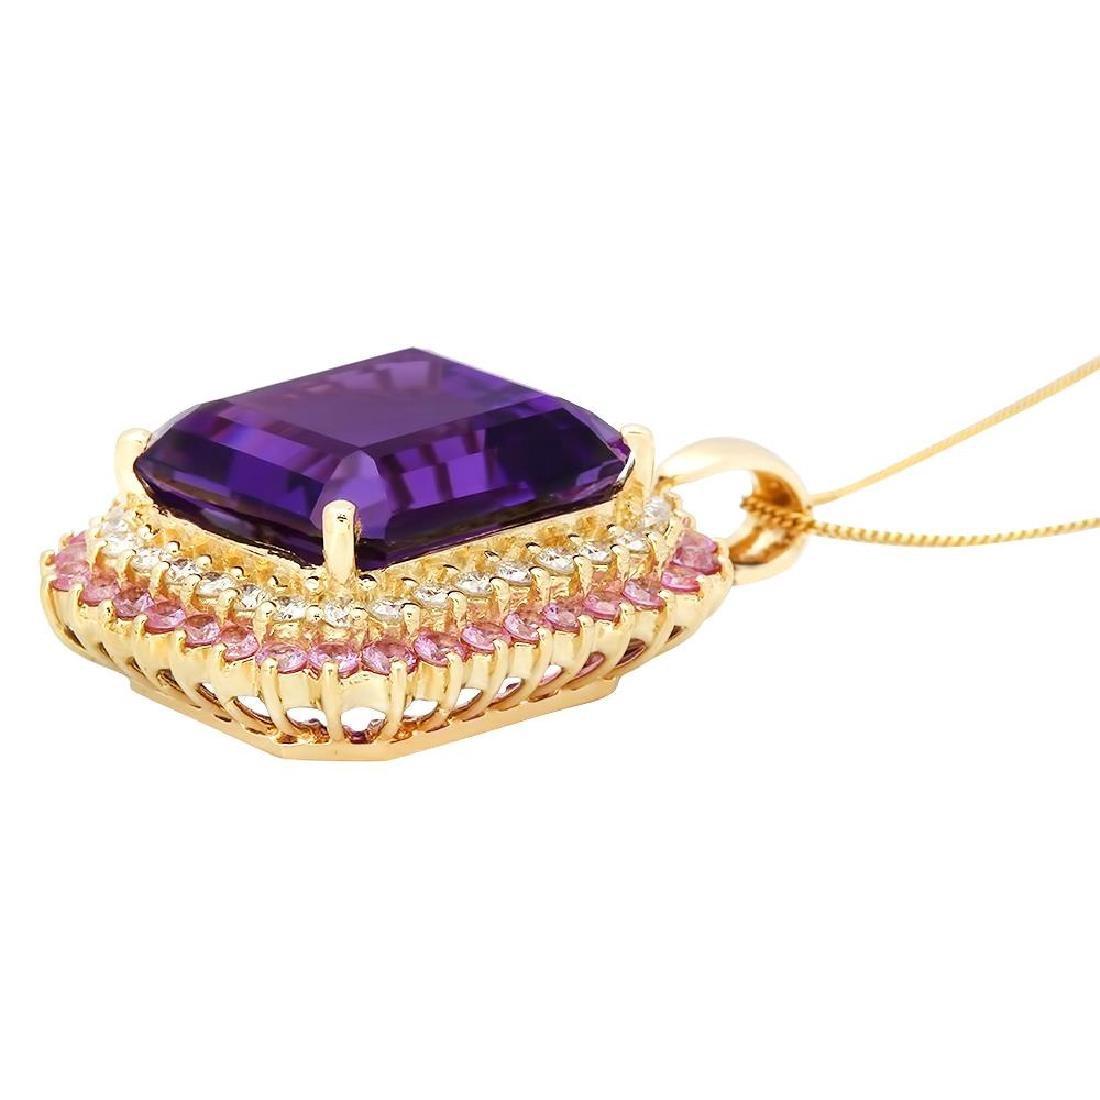 14K Gold 26.16ct Amethyst 2.05ct Sapphire 1.45ct - 2